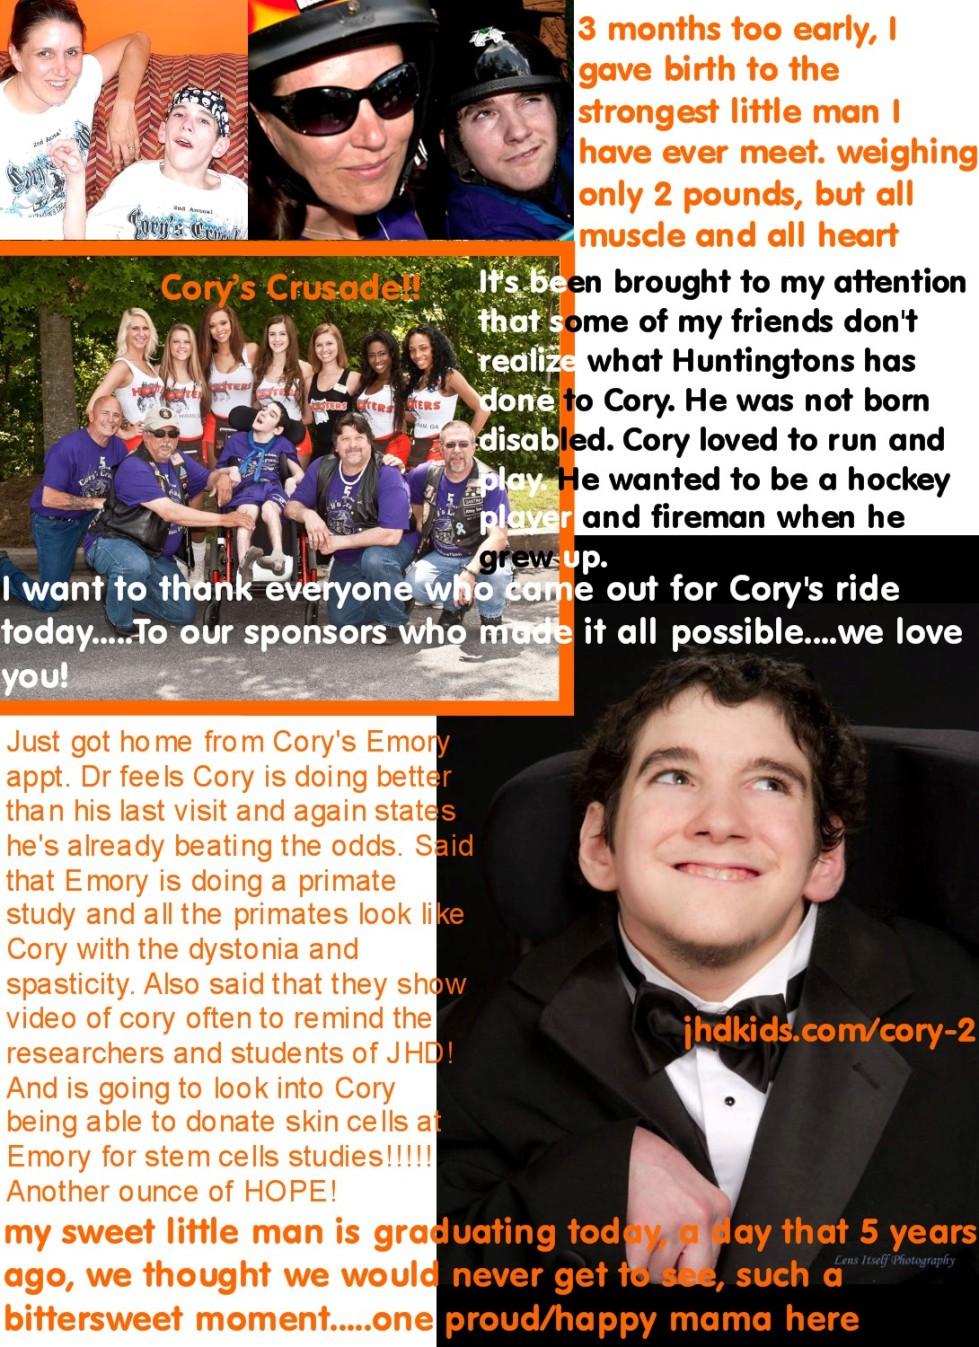 cory's crusade